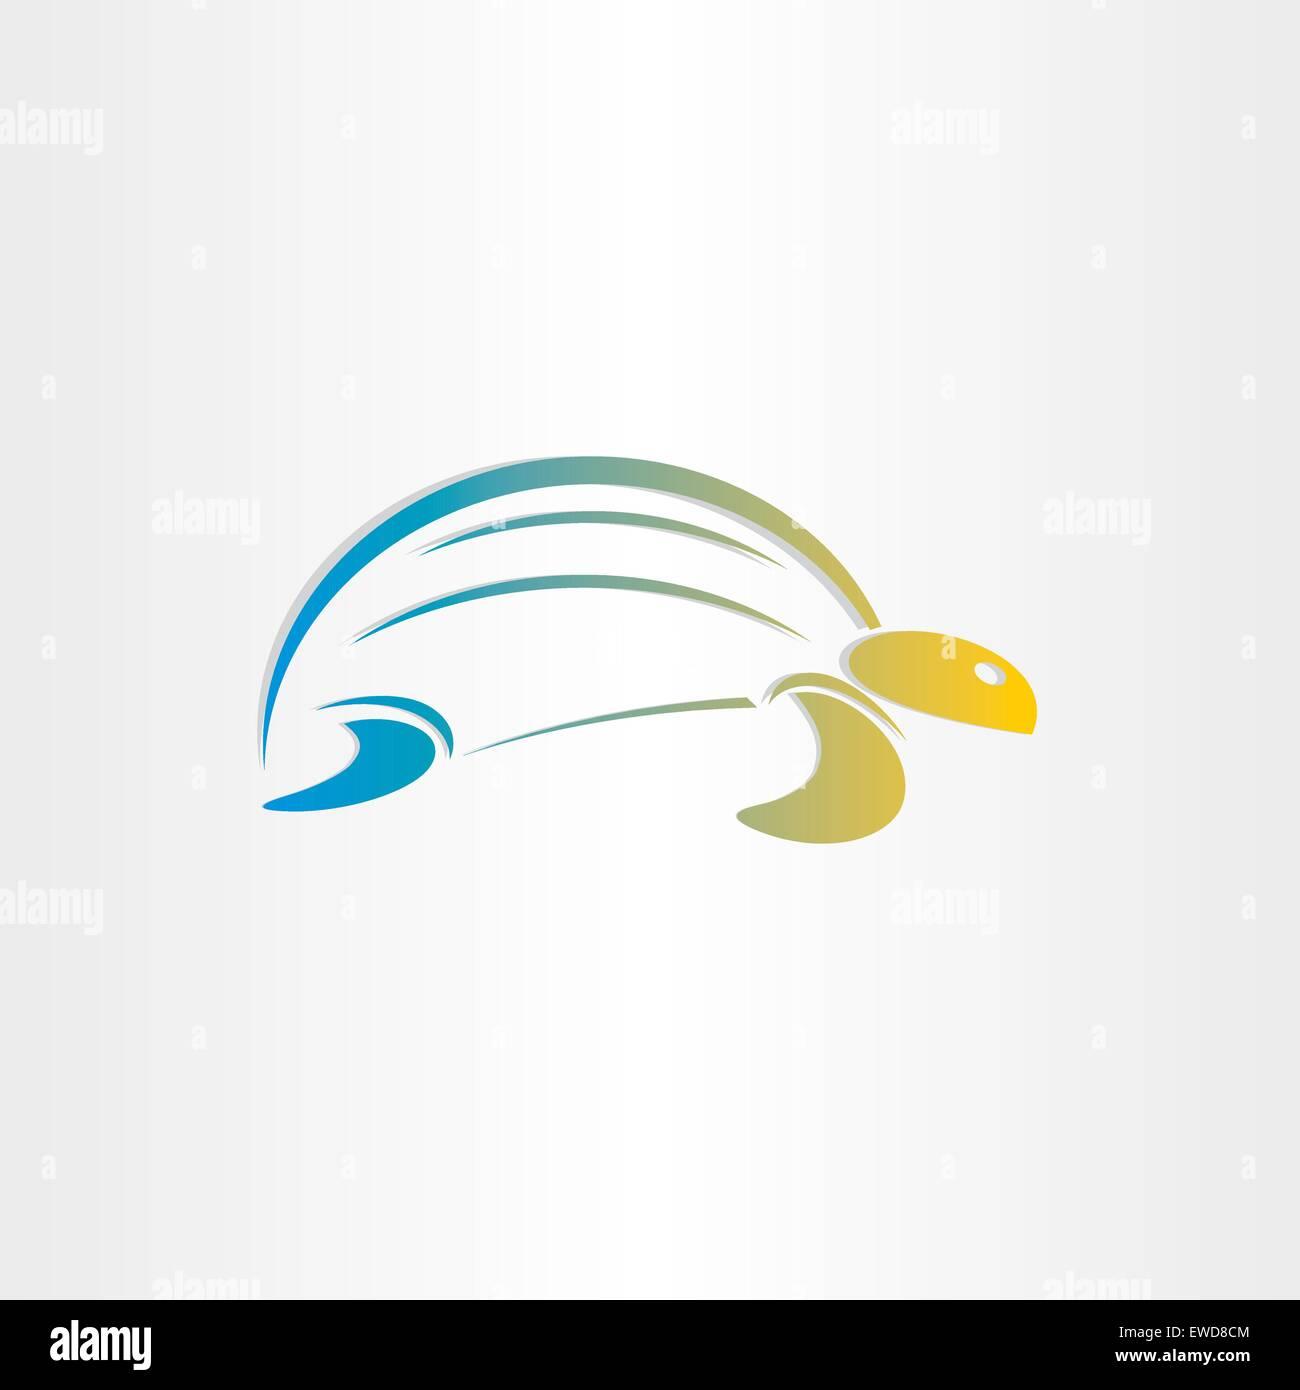 Color turtle stylized symbol design stock vector art color turtle stylized symbol design biocorpaavc